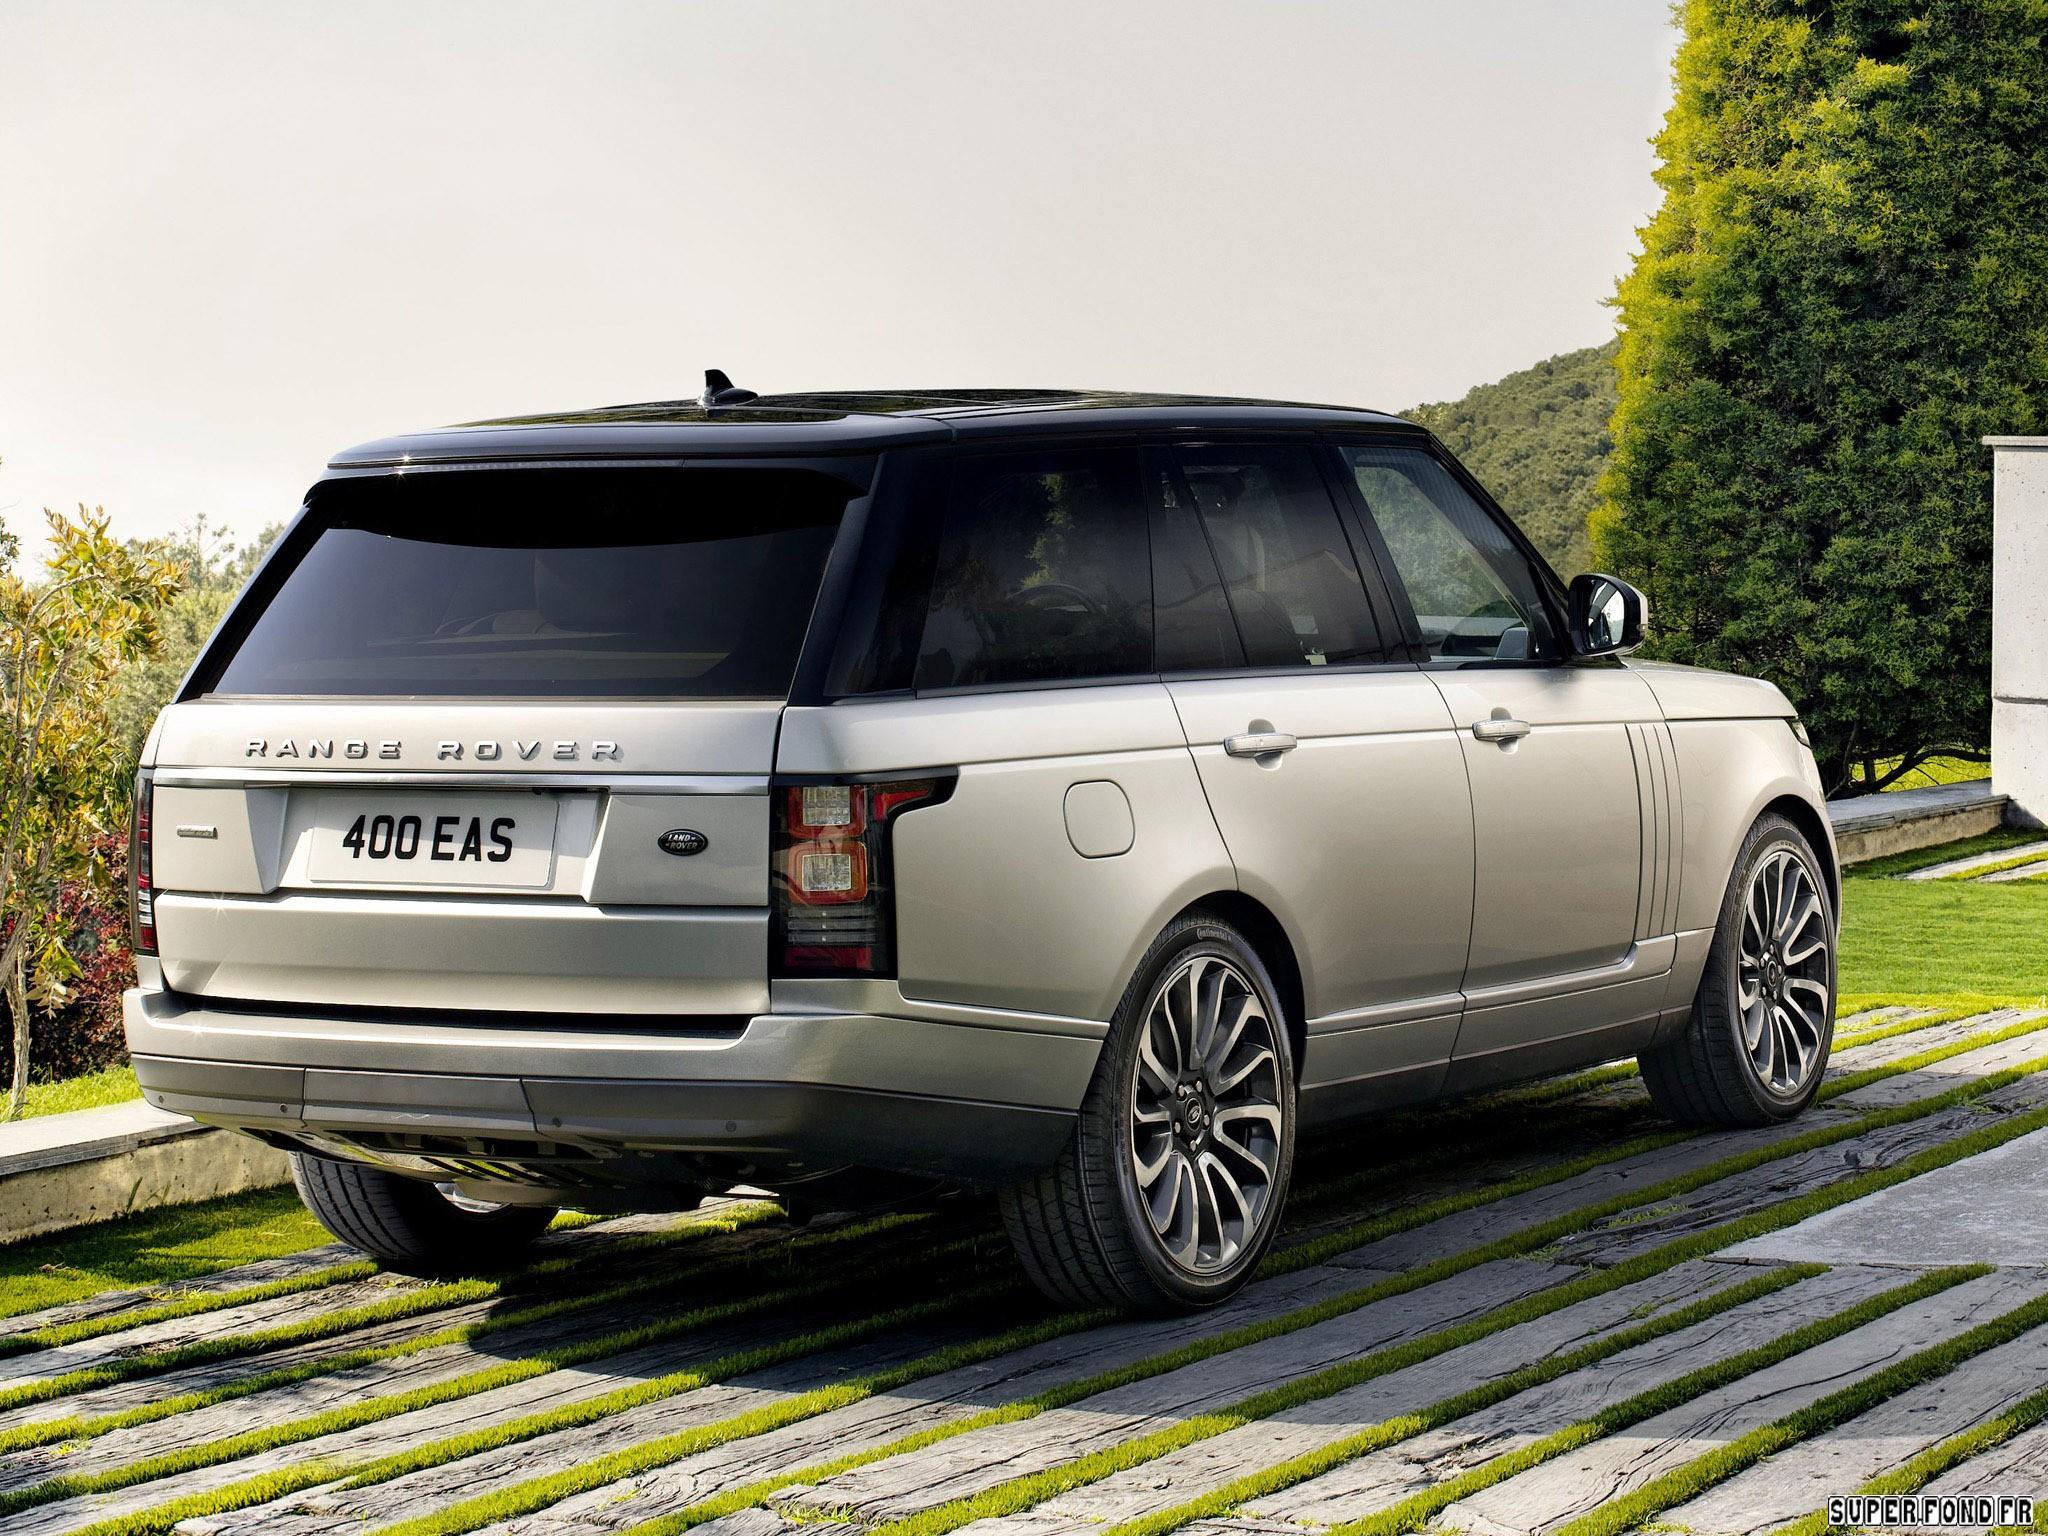 2013 Land Rover Range Rover Autobiography